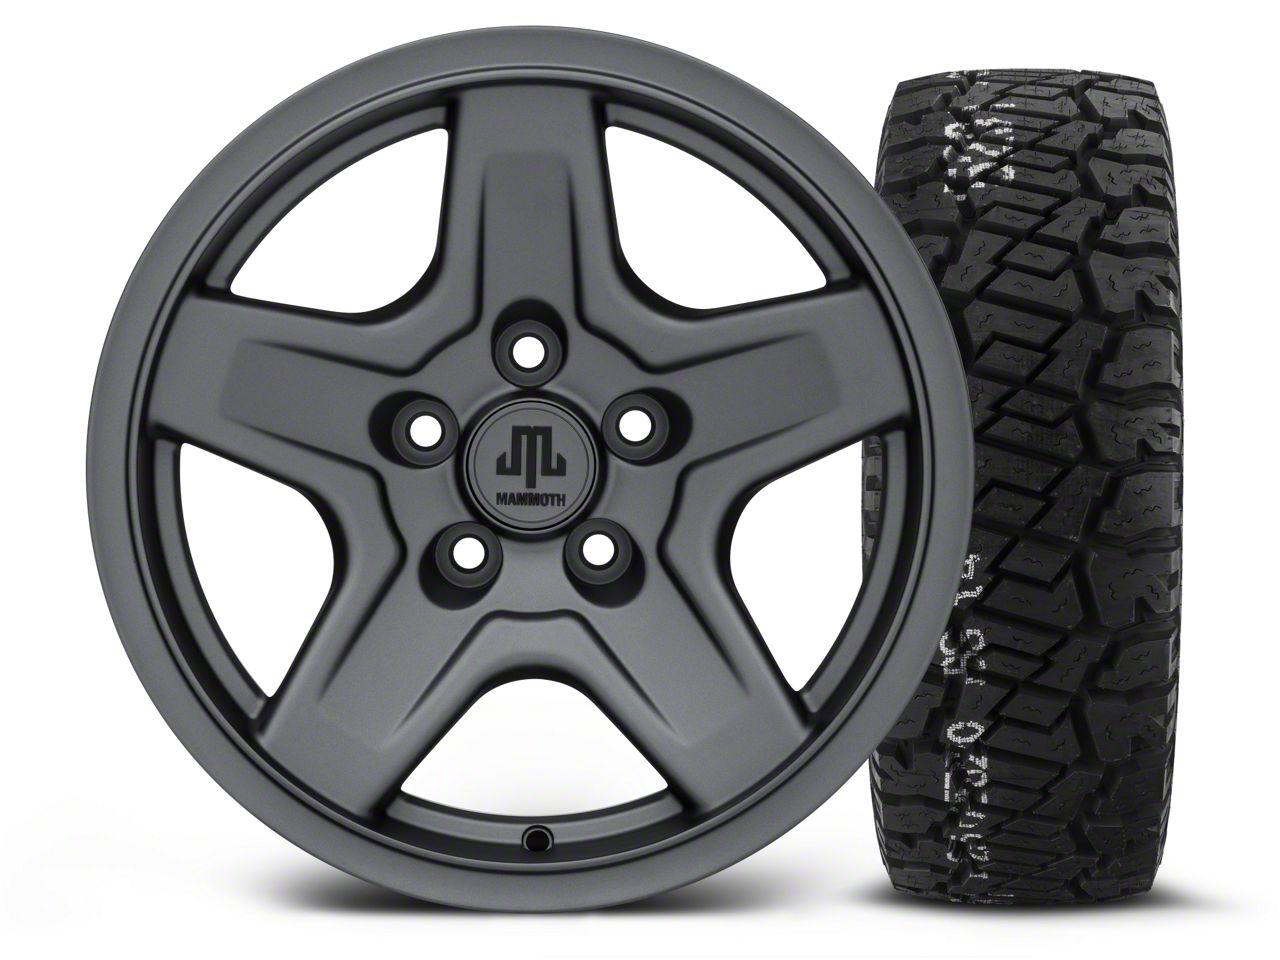 Mammoth Boulder Charcoal 16x8 Wheel & BF Goodrich All Terrain TA KO2 315/75R16 Tire Kit (87-06 Jeep Wrangler YJ & TJ)